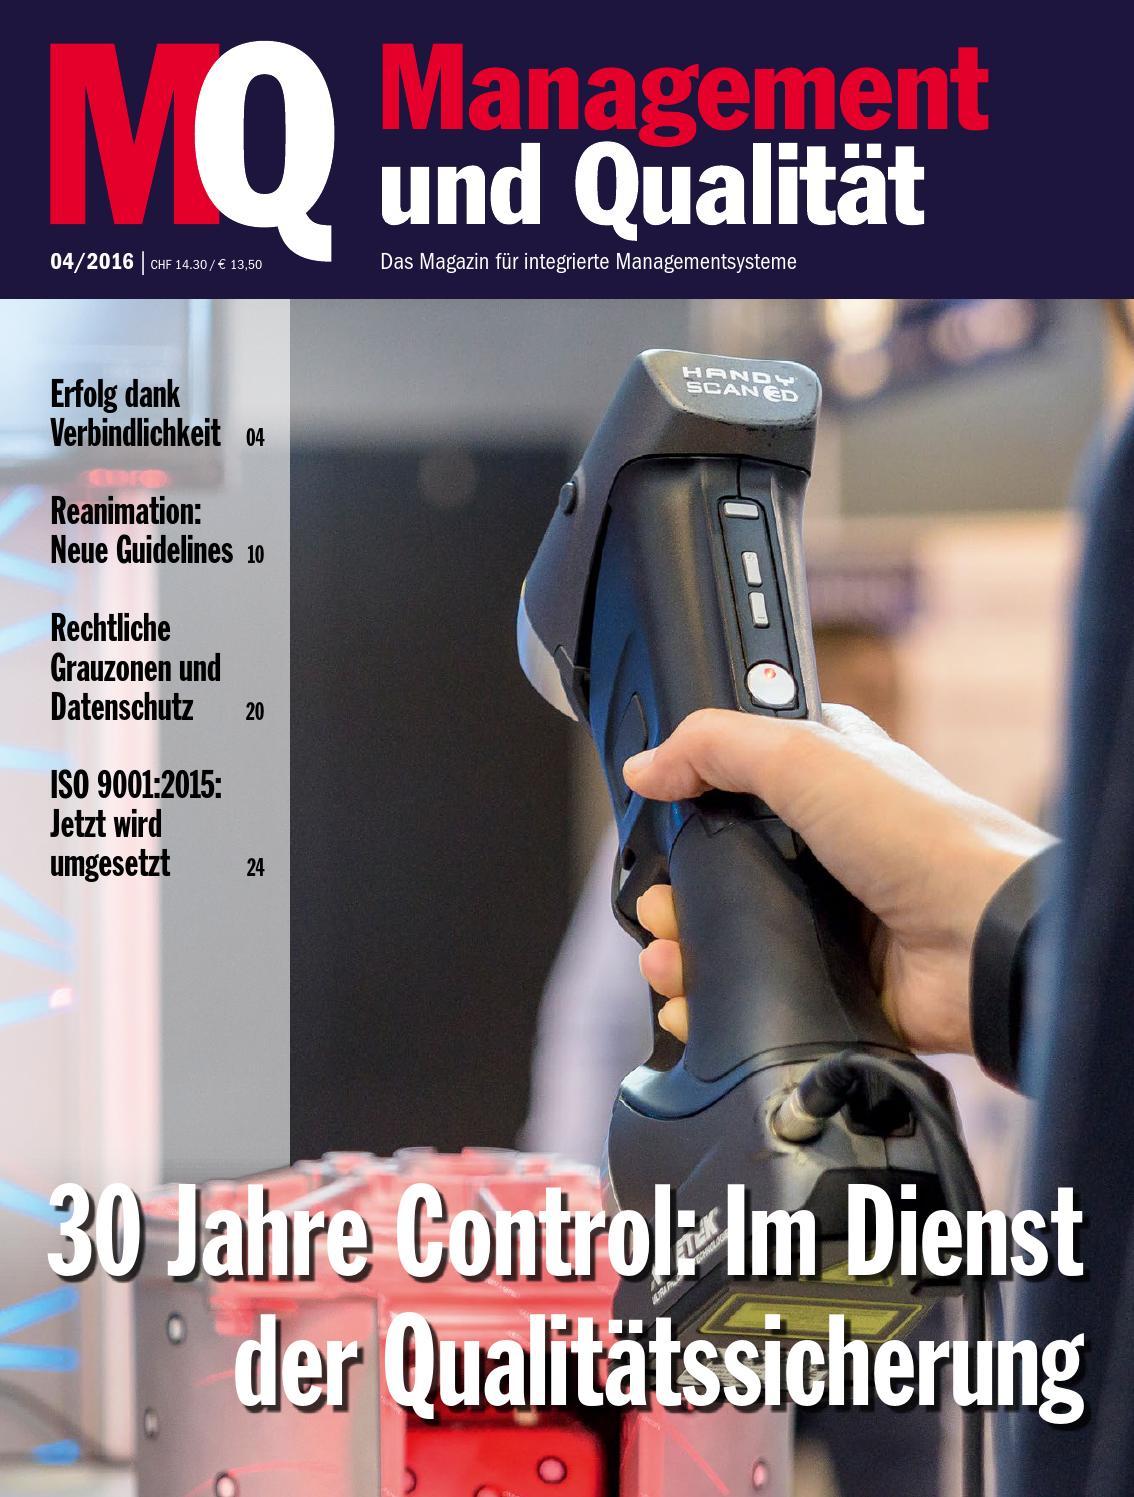 MQ Management und Qualität by SAQ Swiss Association for Quality - issuu